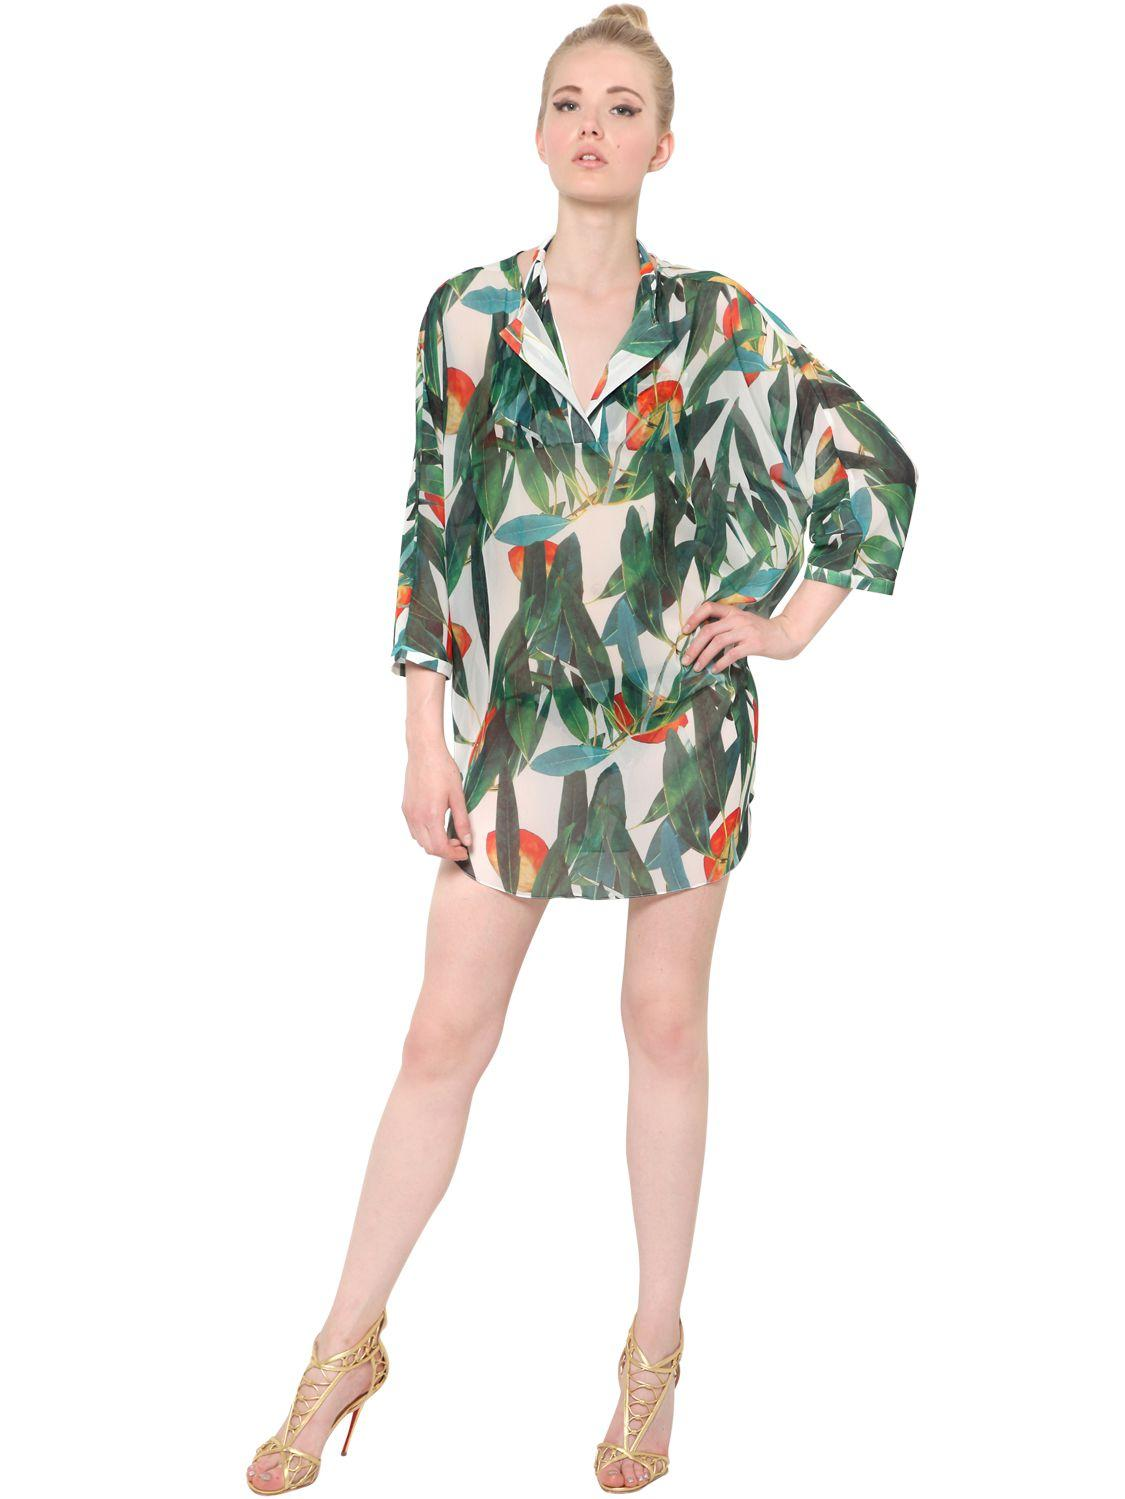 les petites robes d t pour mettre en valeur ses jambes bronz es madame figaro. Black Bedroom Furniture Sets. Home Design Ideas